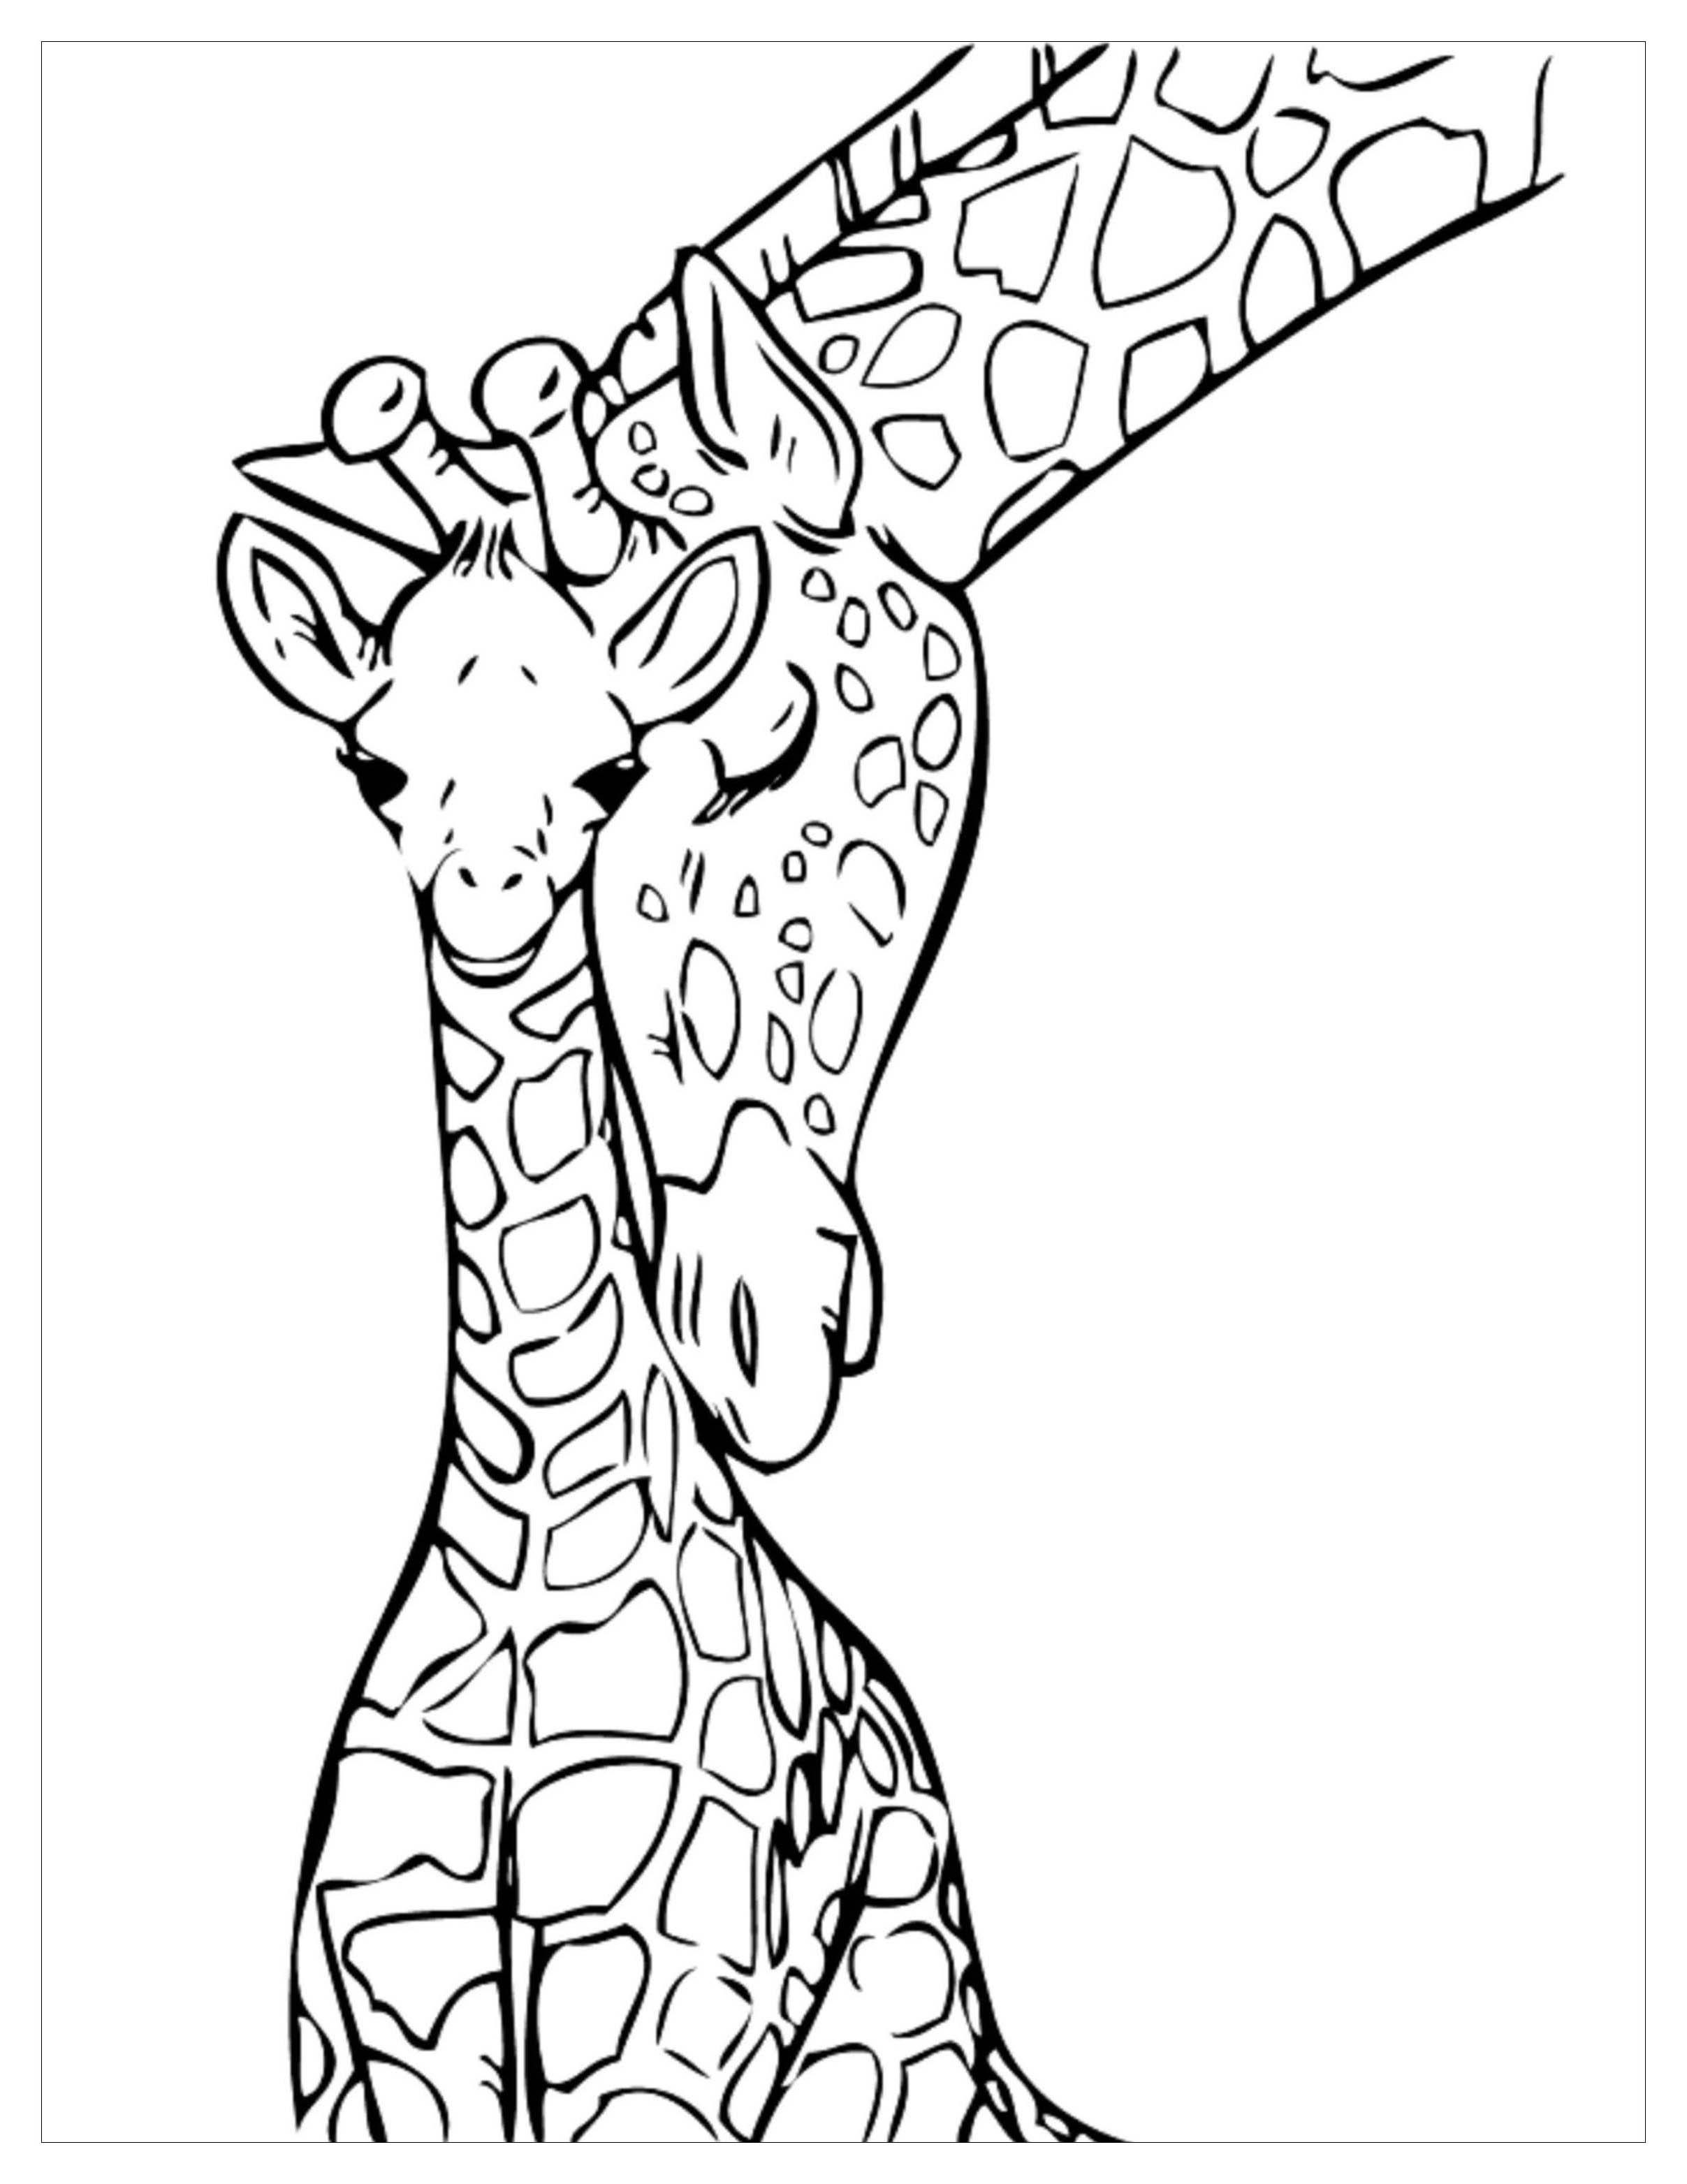 Baby Giraffe Coloring Page Download Coloriage De Girafes